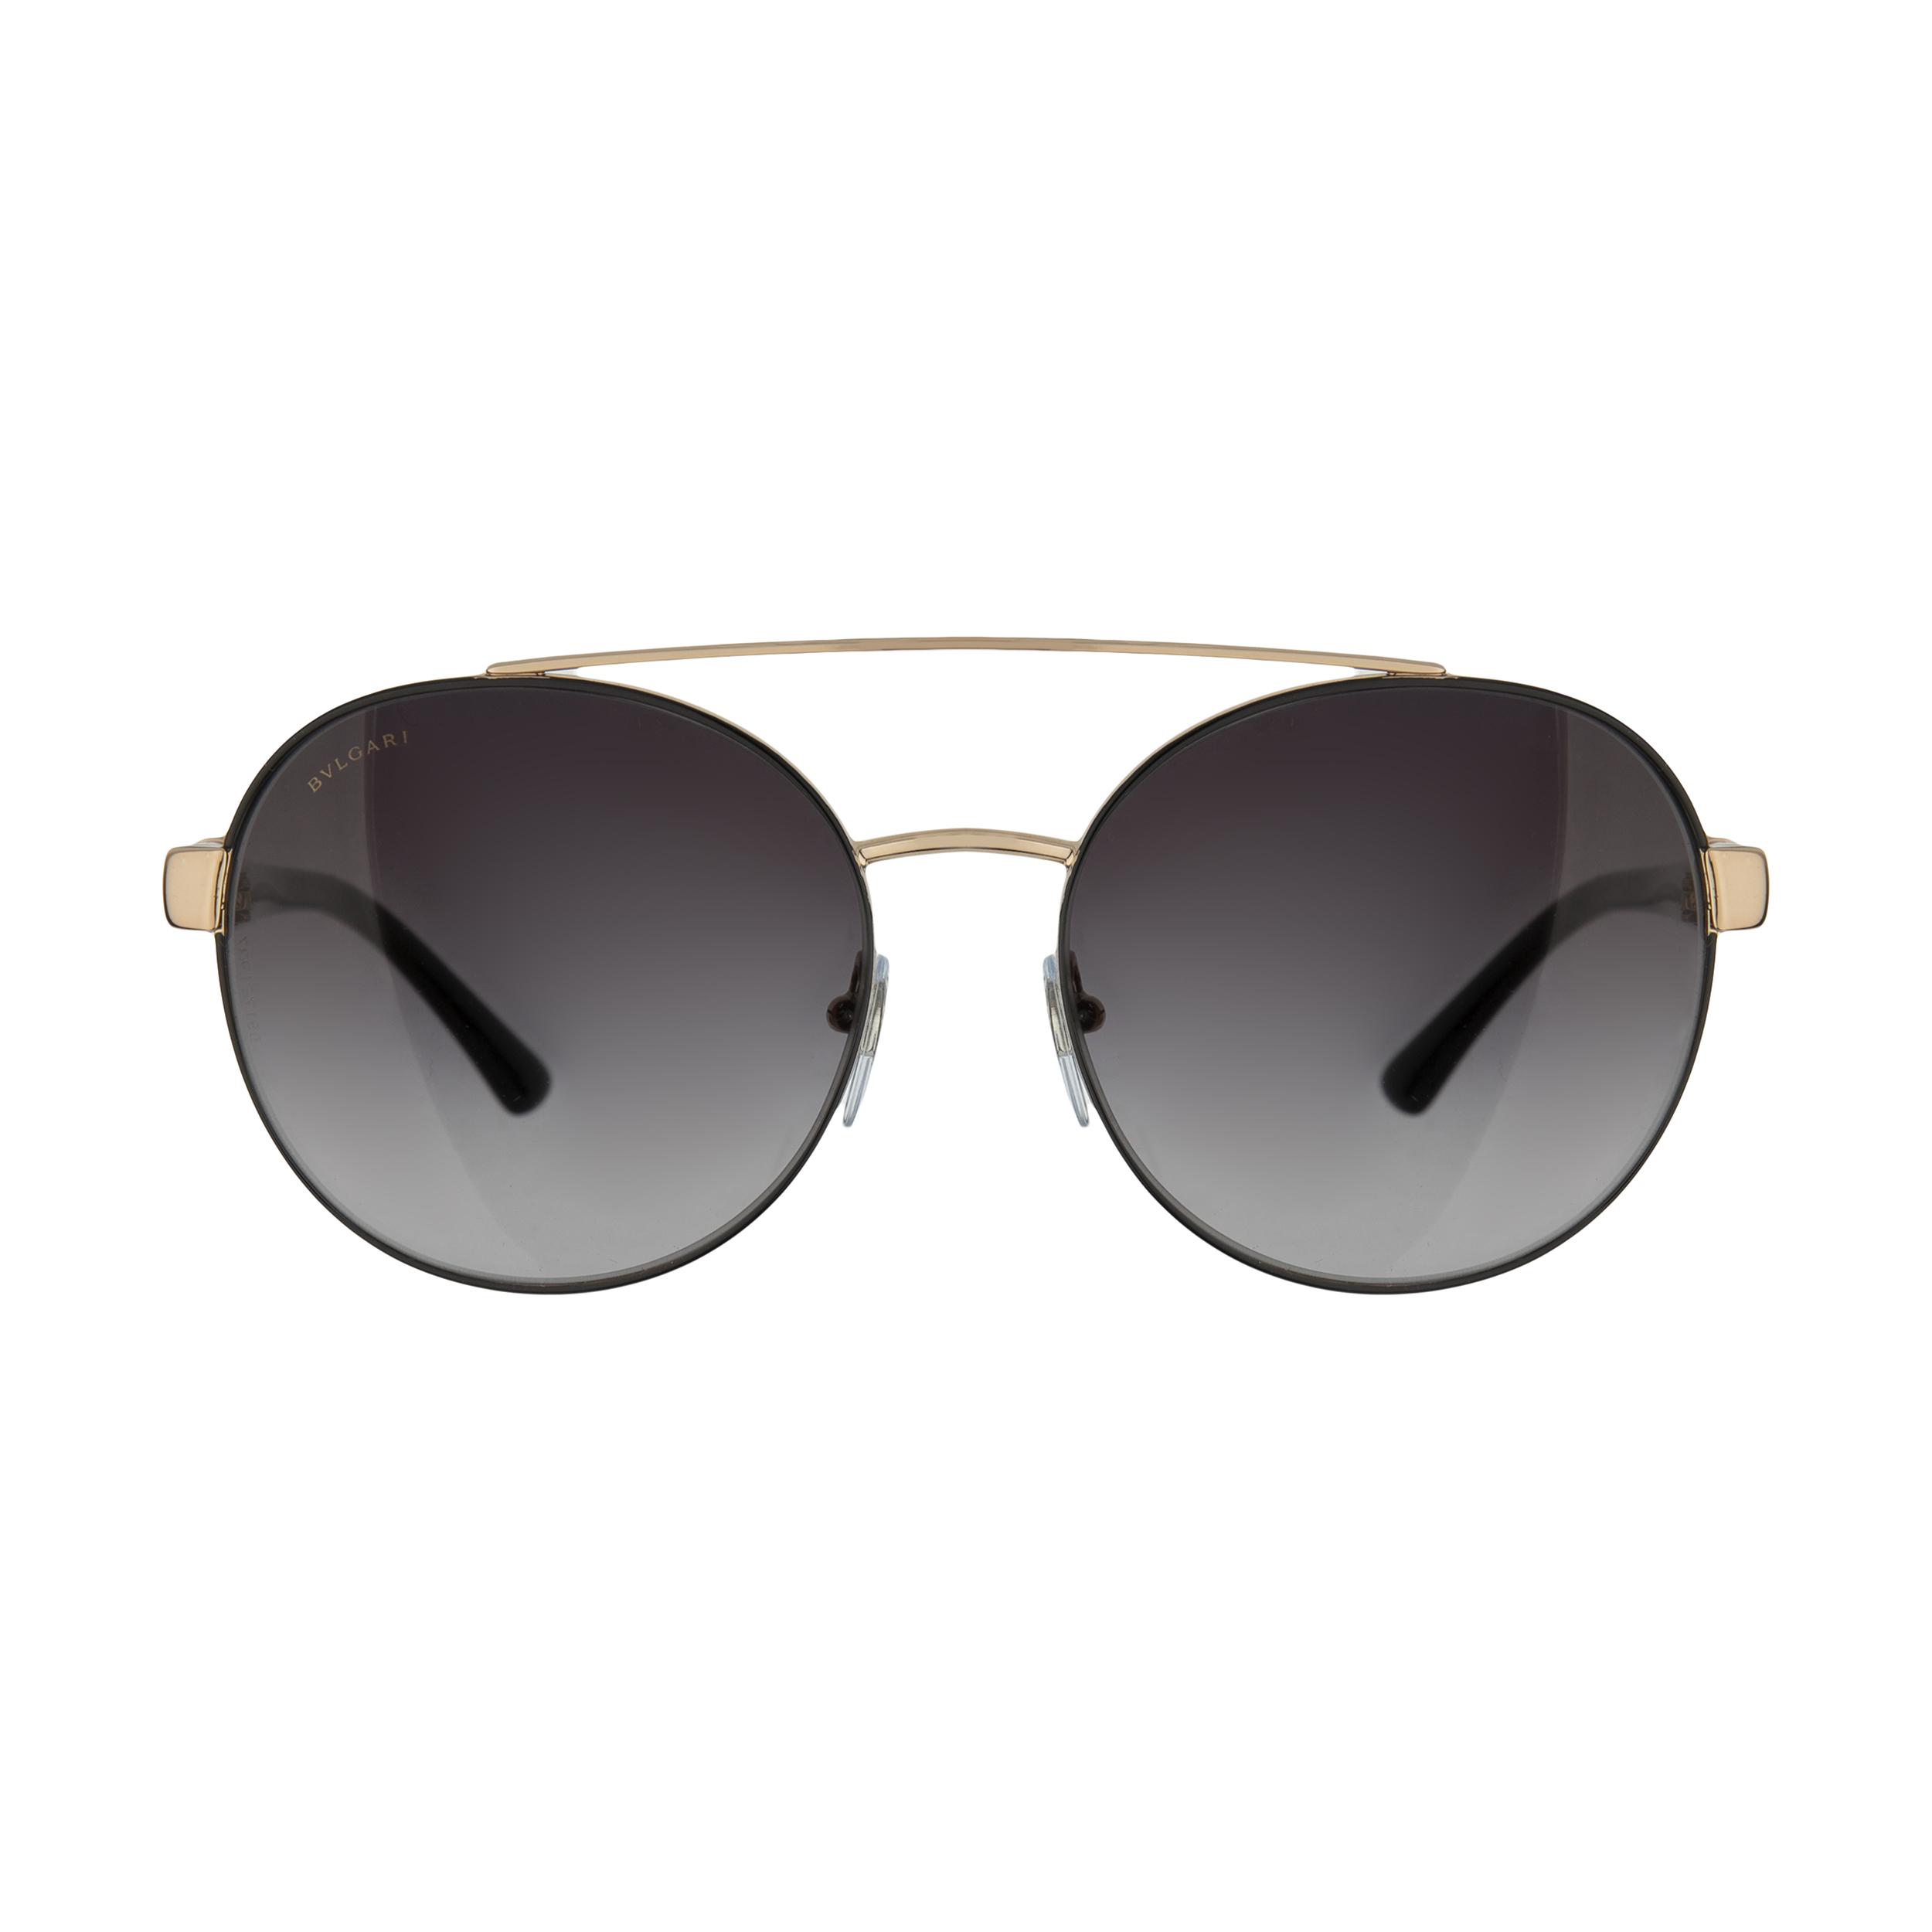 عینک آفتابی زنانه بولگاری مدل BV6085B 20238G -  - 2